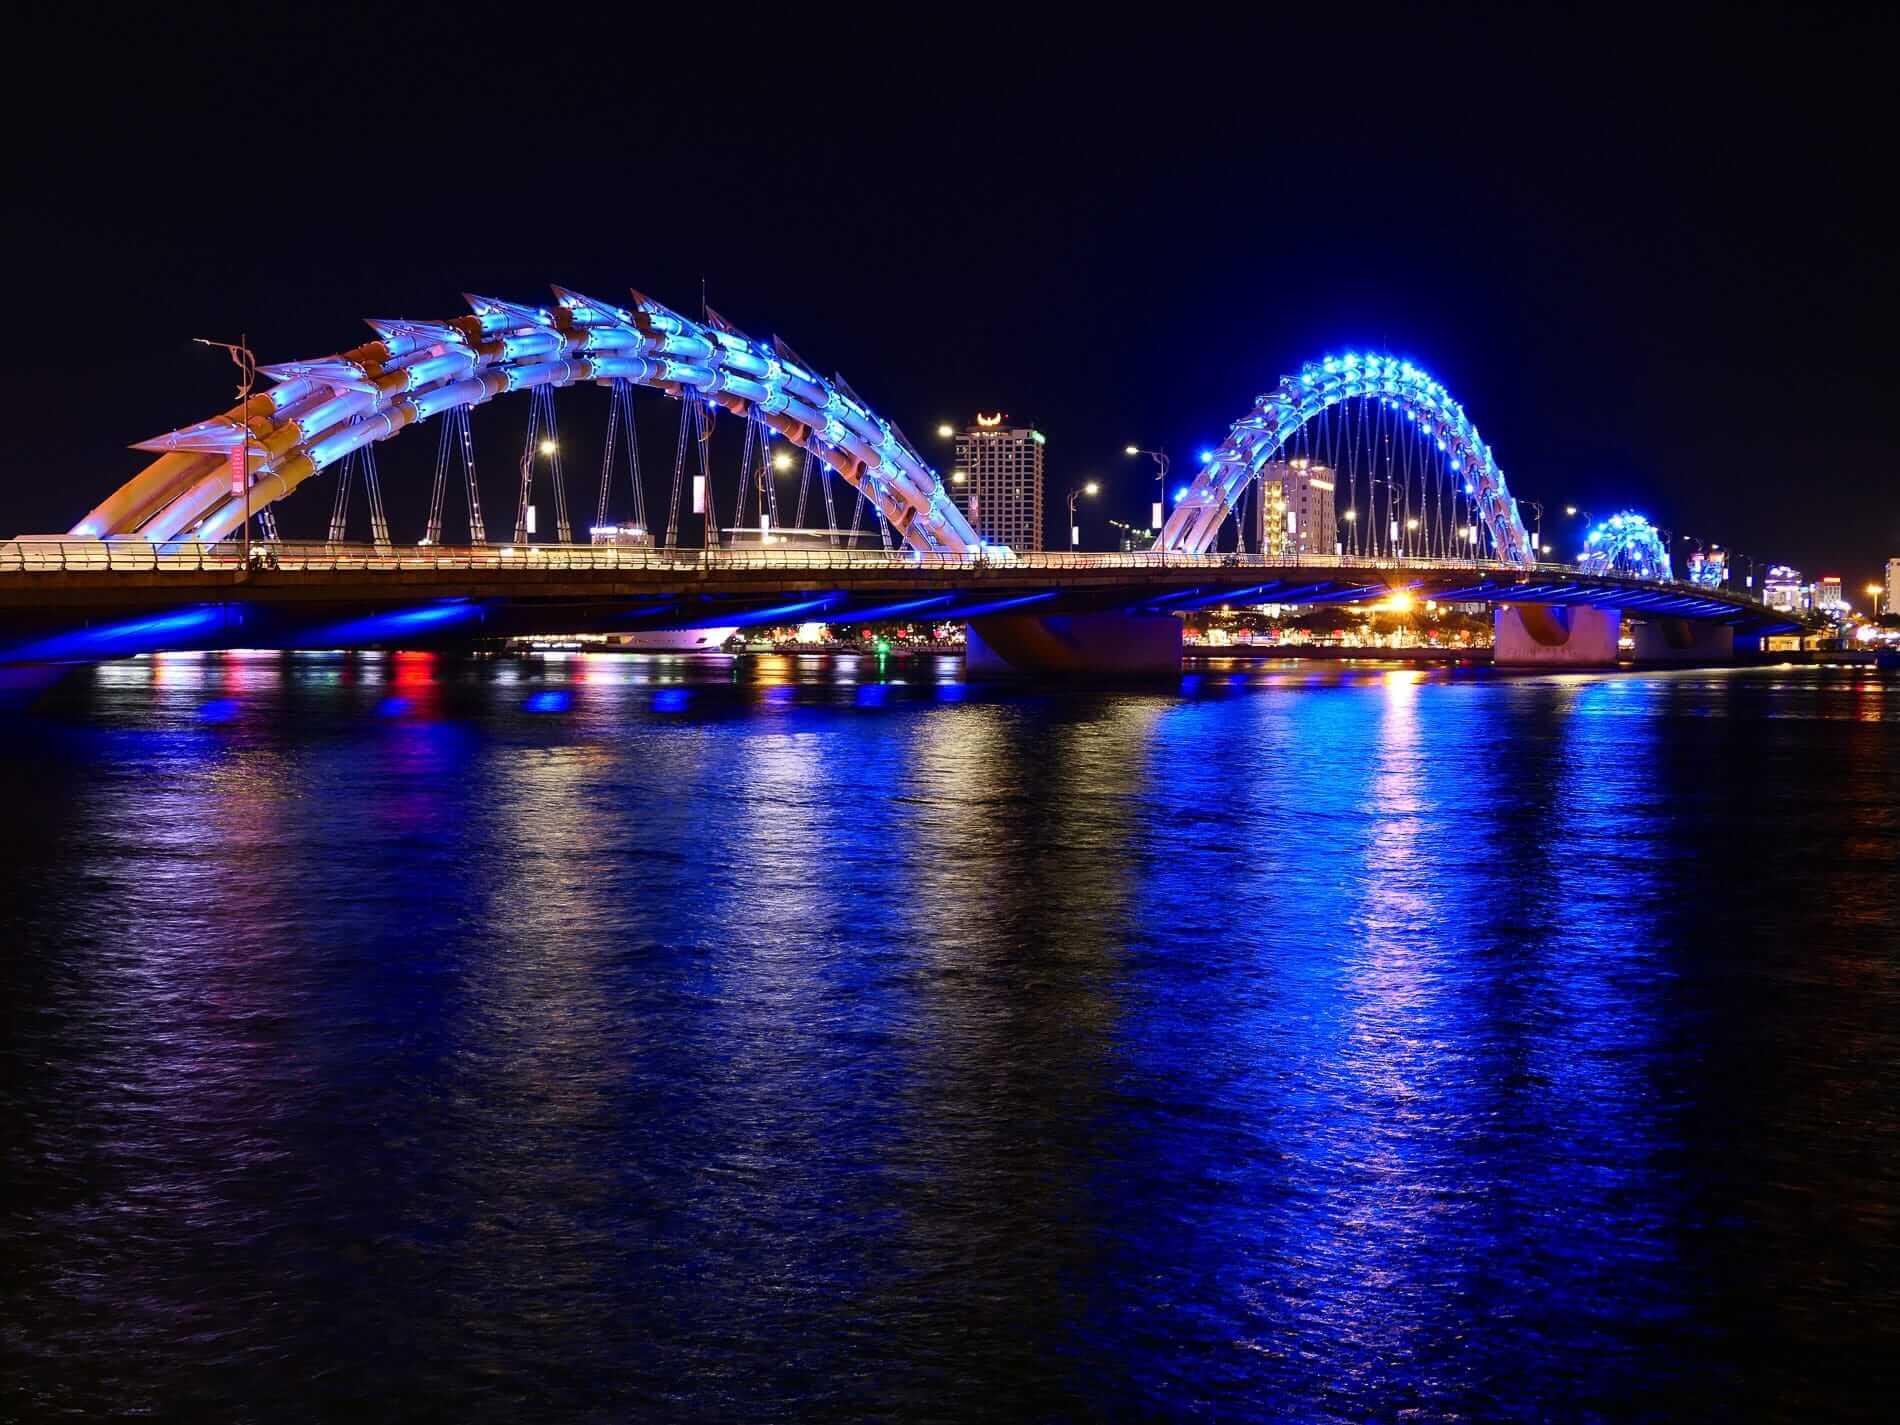 Da nang's tail light at night